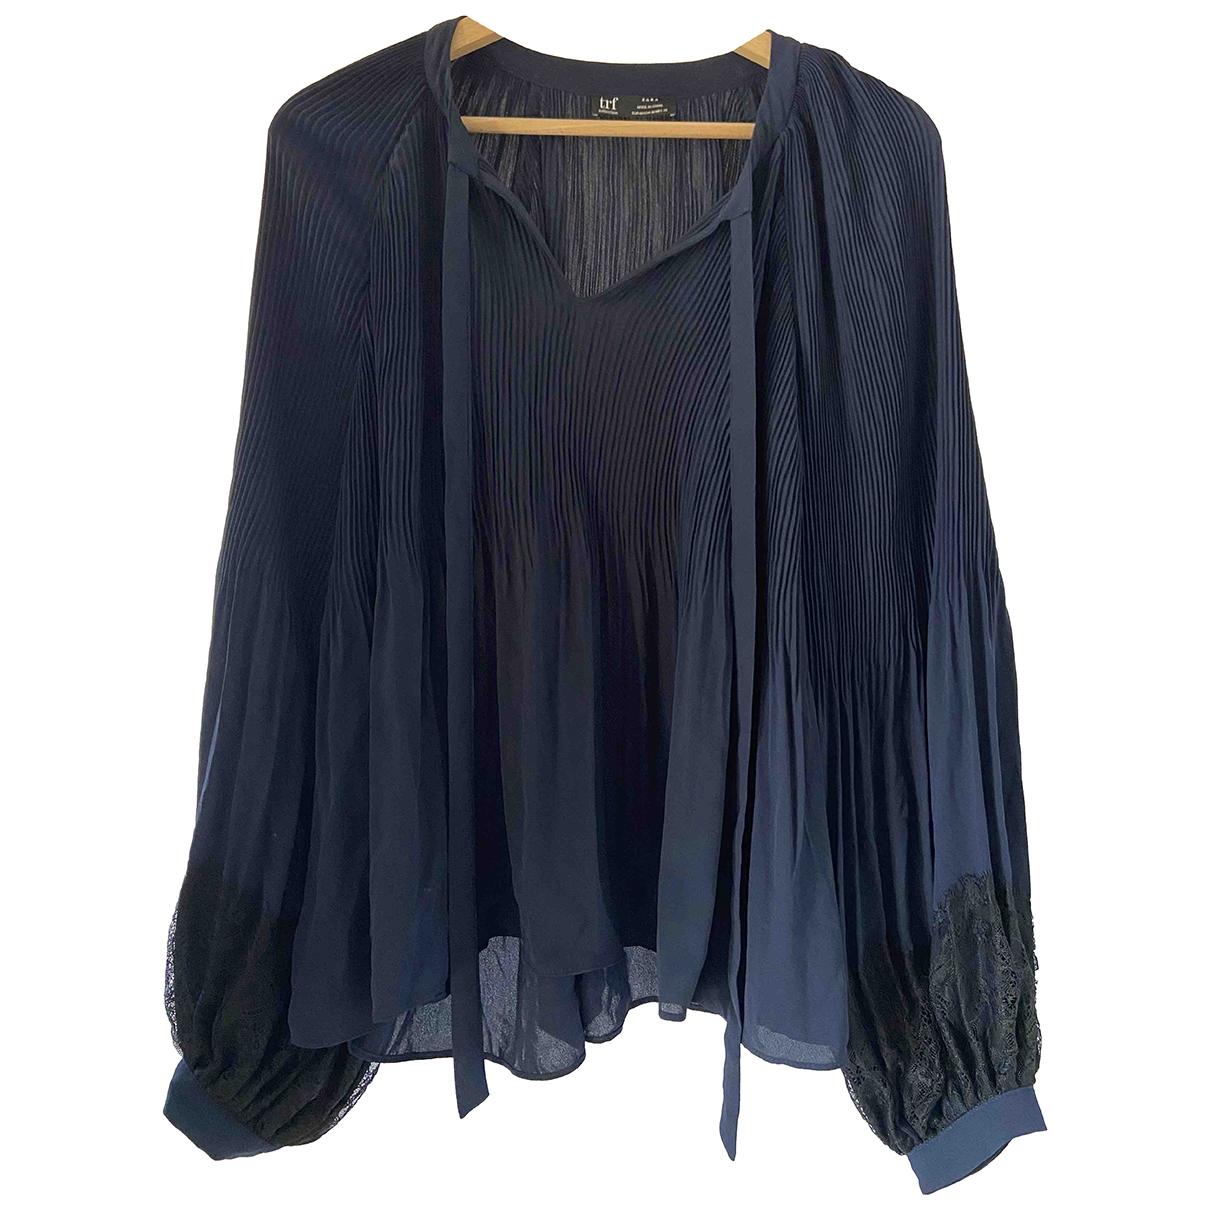 Zara \N Blue  top for Women M International